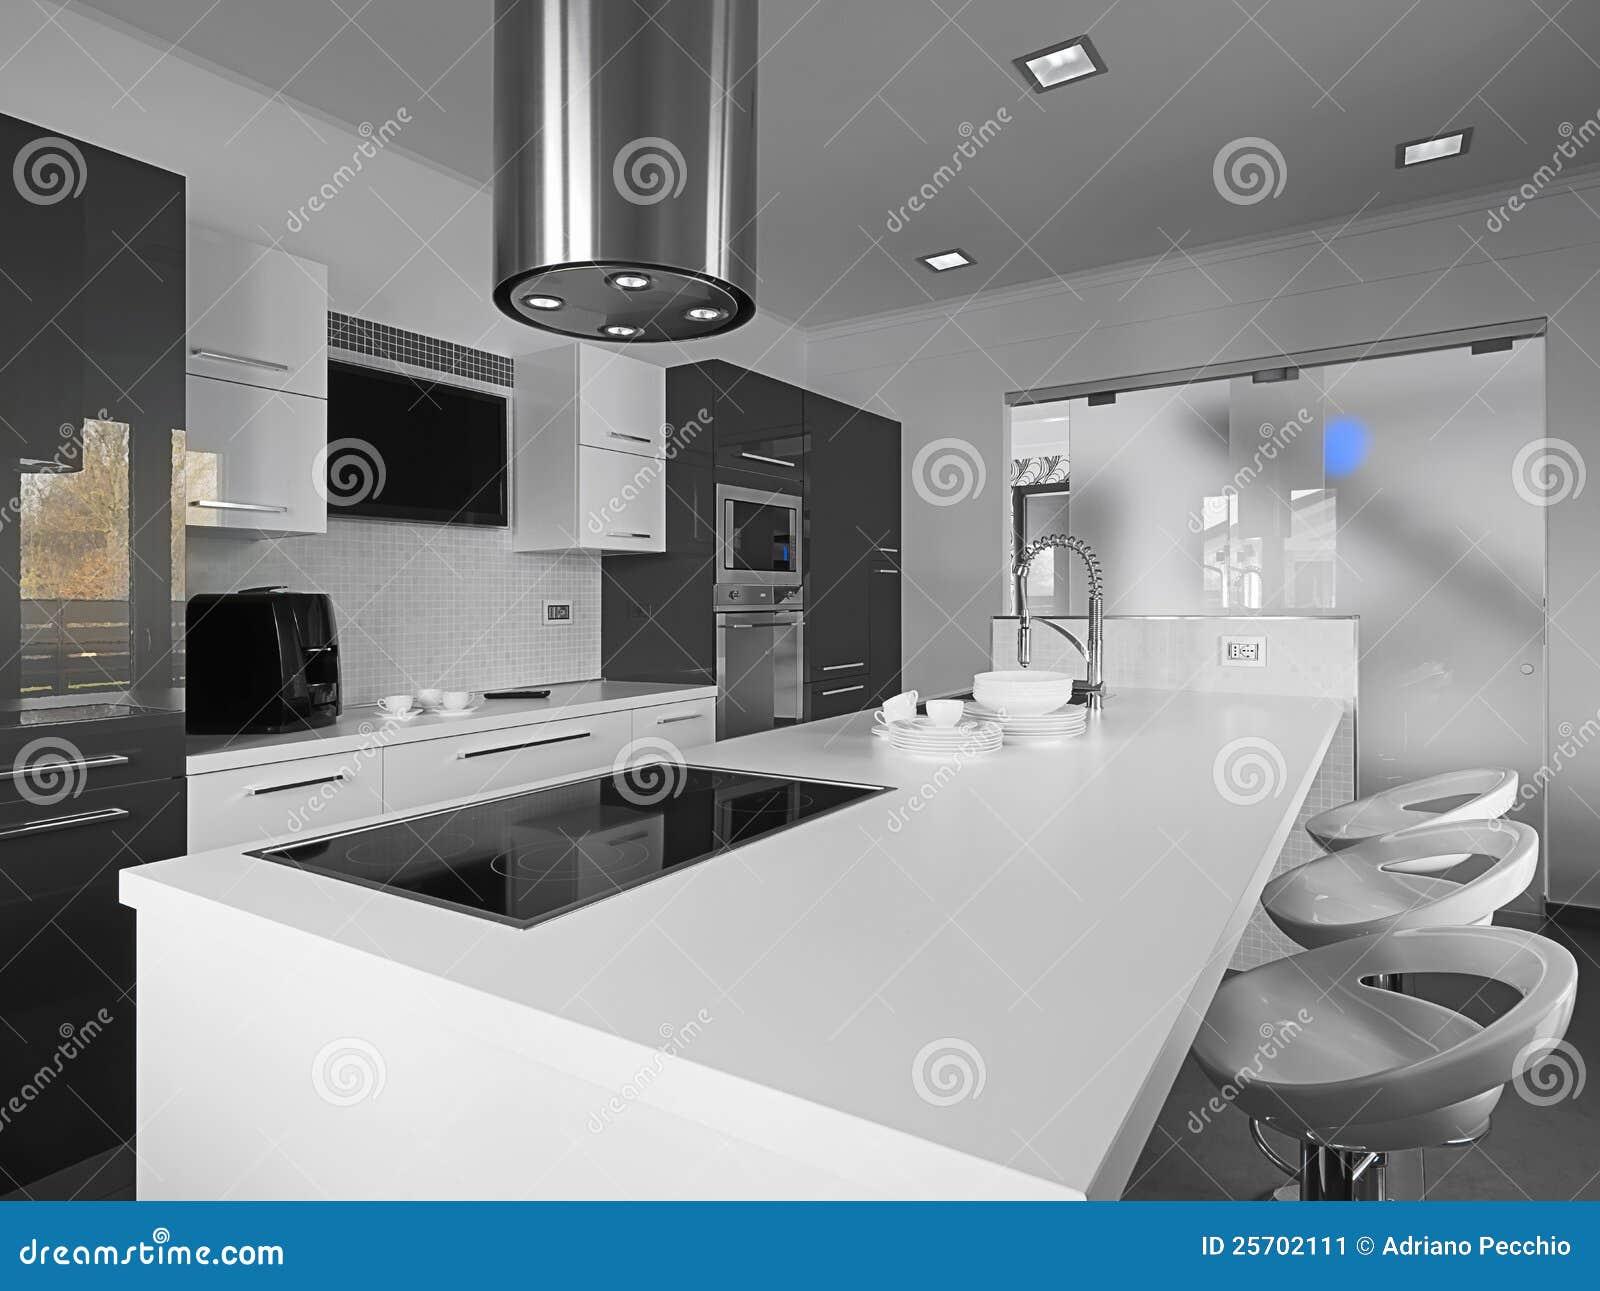 Moderne keuken in zwart wit stock afbeelding afbeelding 25702111 - Afbeelding moderne keuken ...